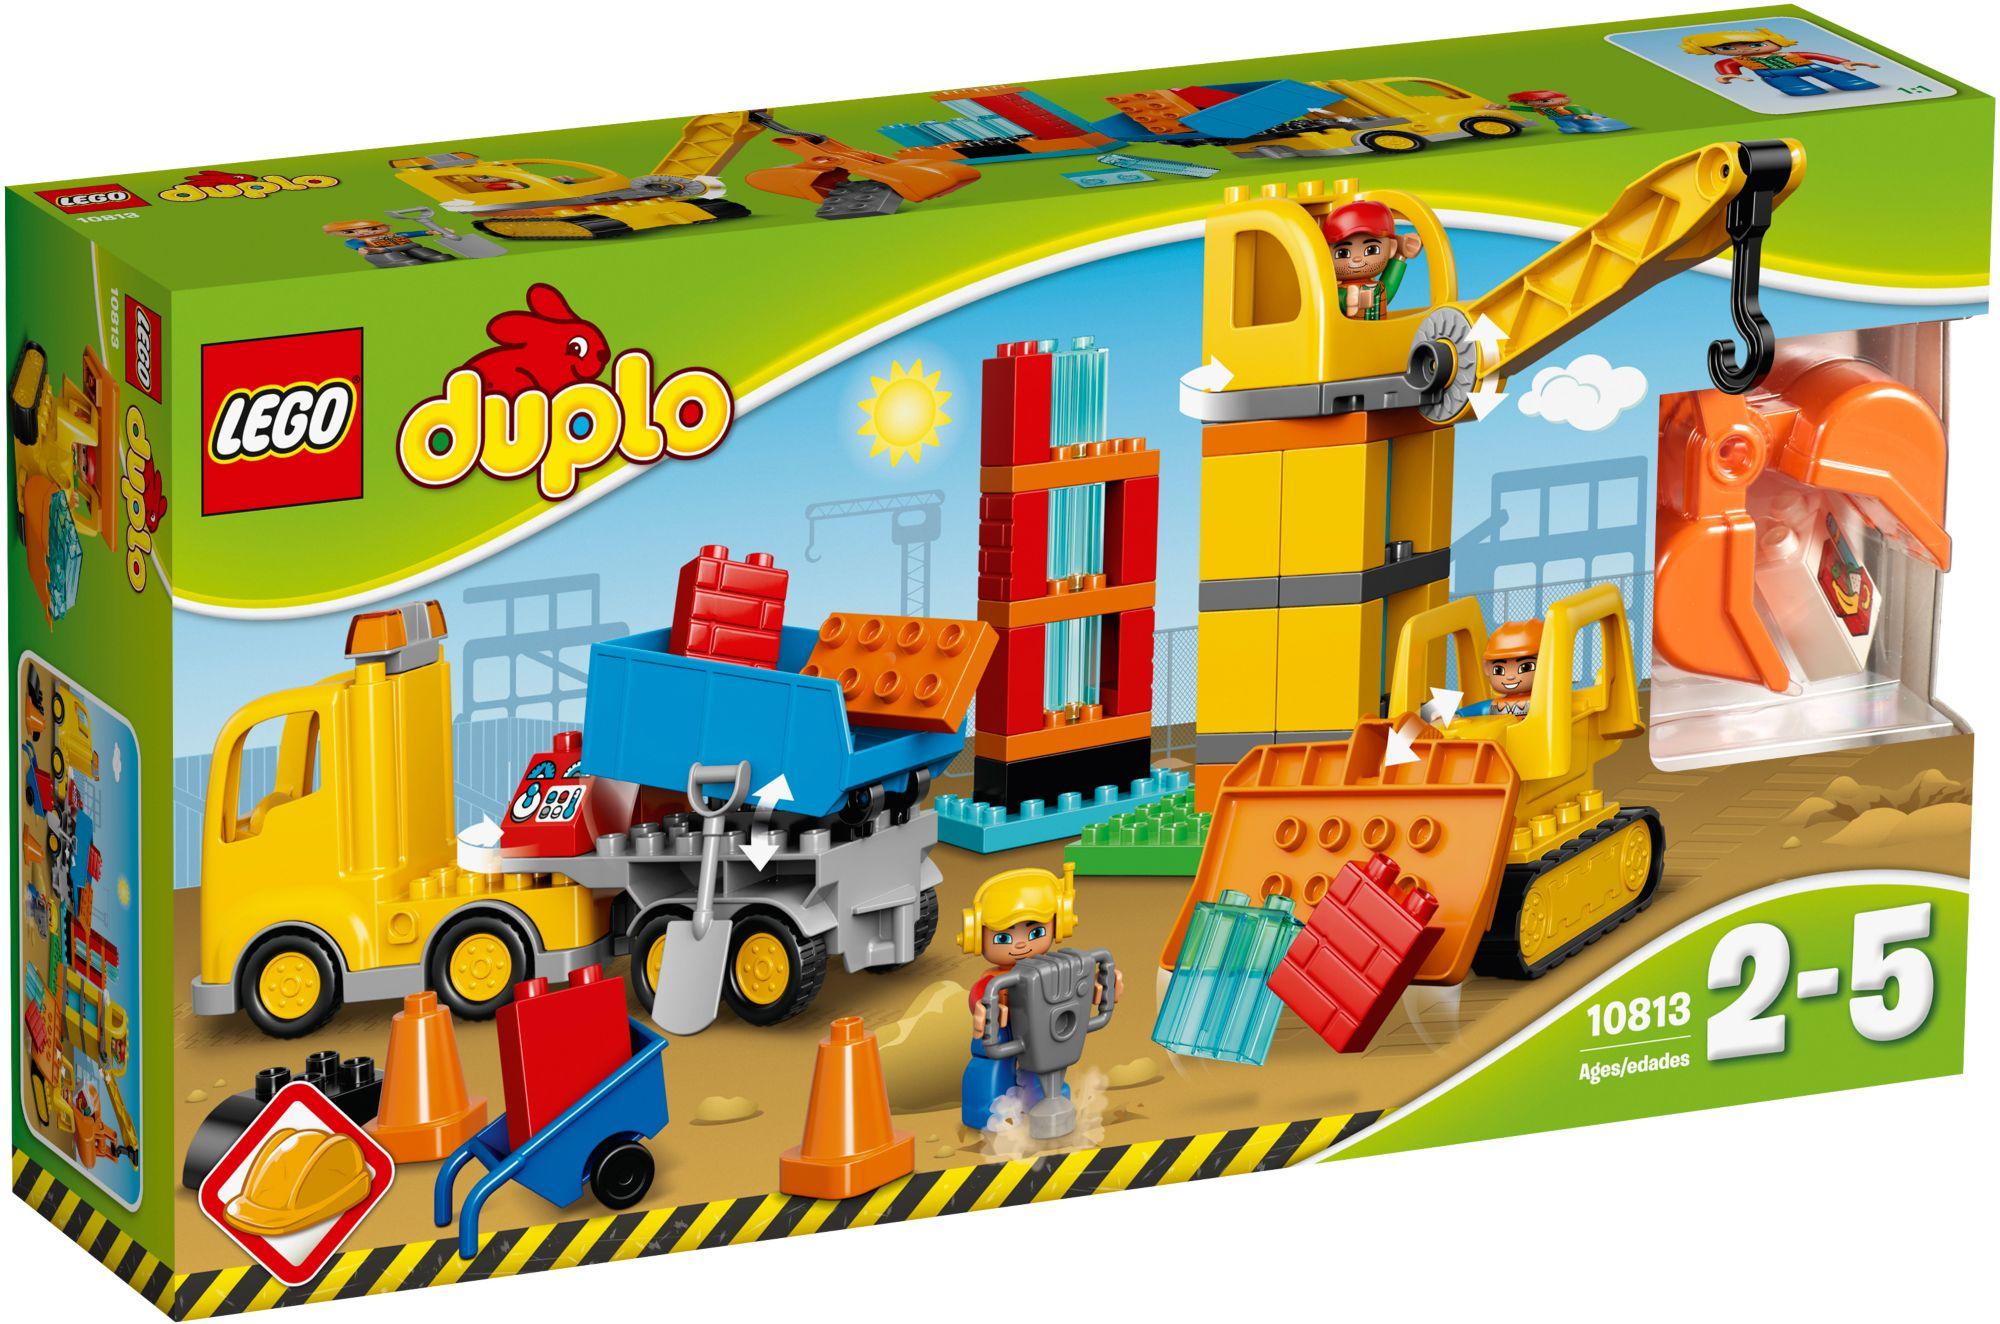 LEGO® 10813 DUPLO Große Baustelle, Konstruktionsspielzeug